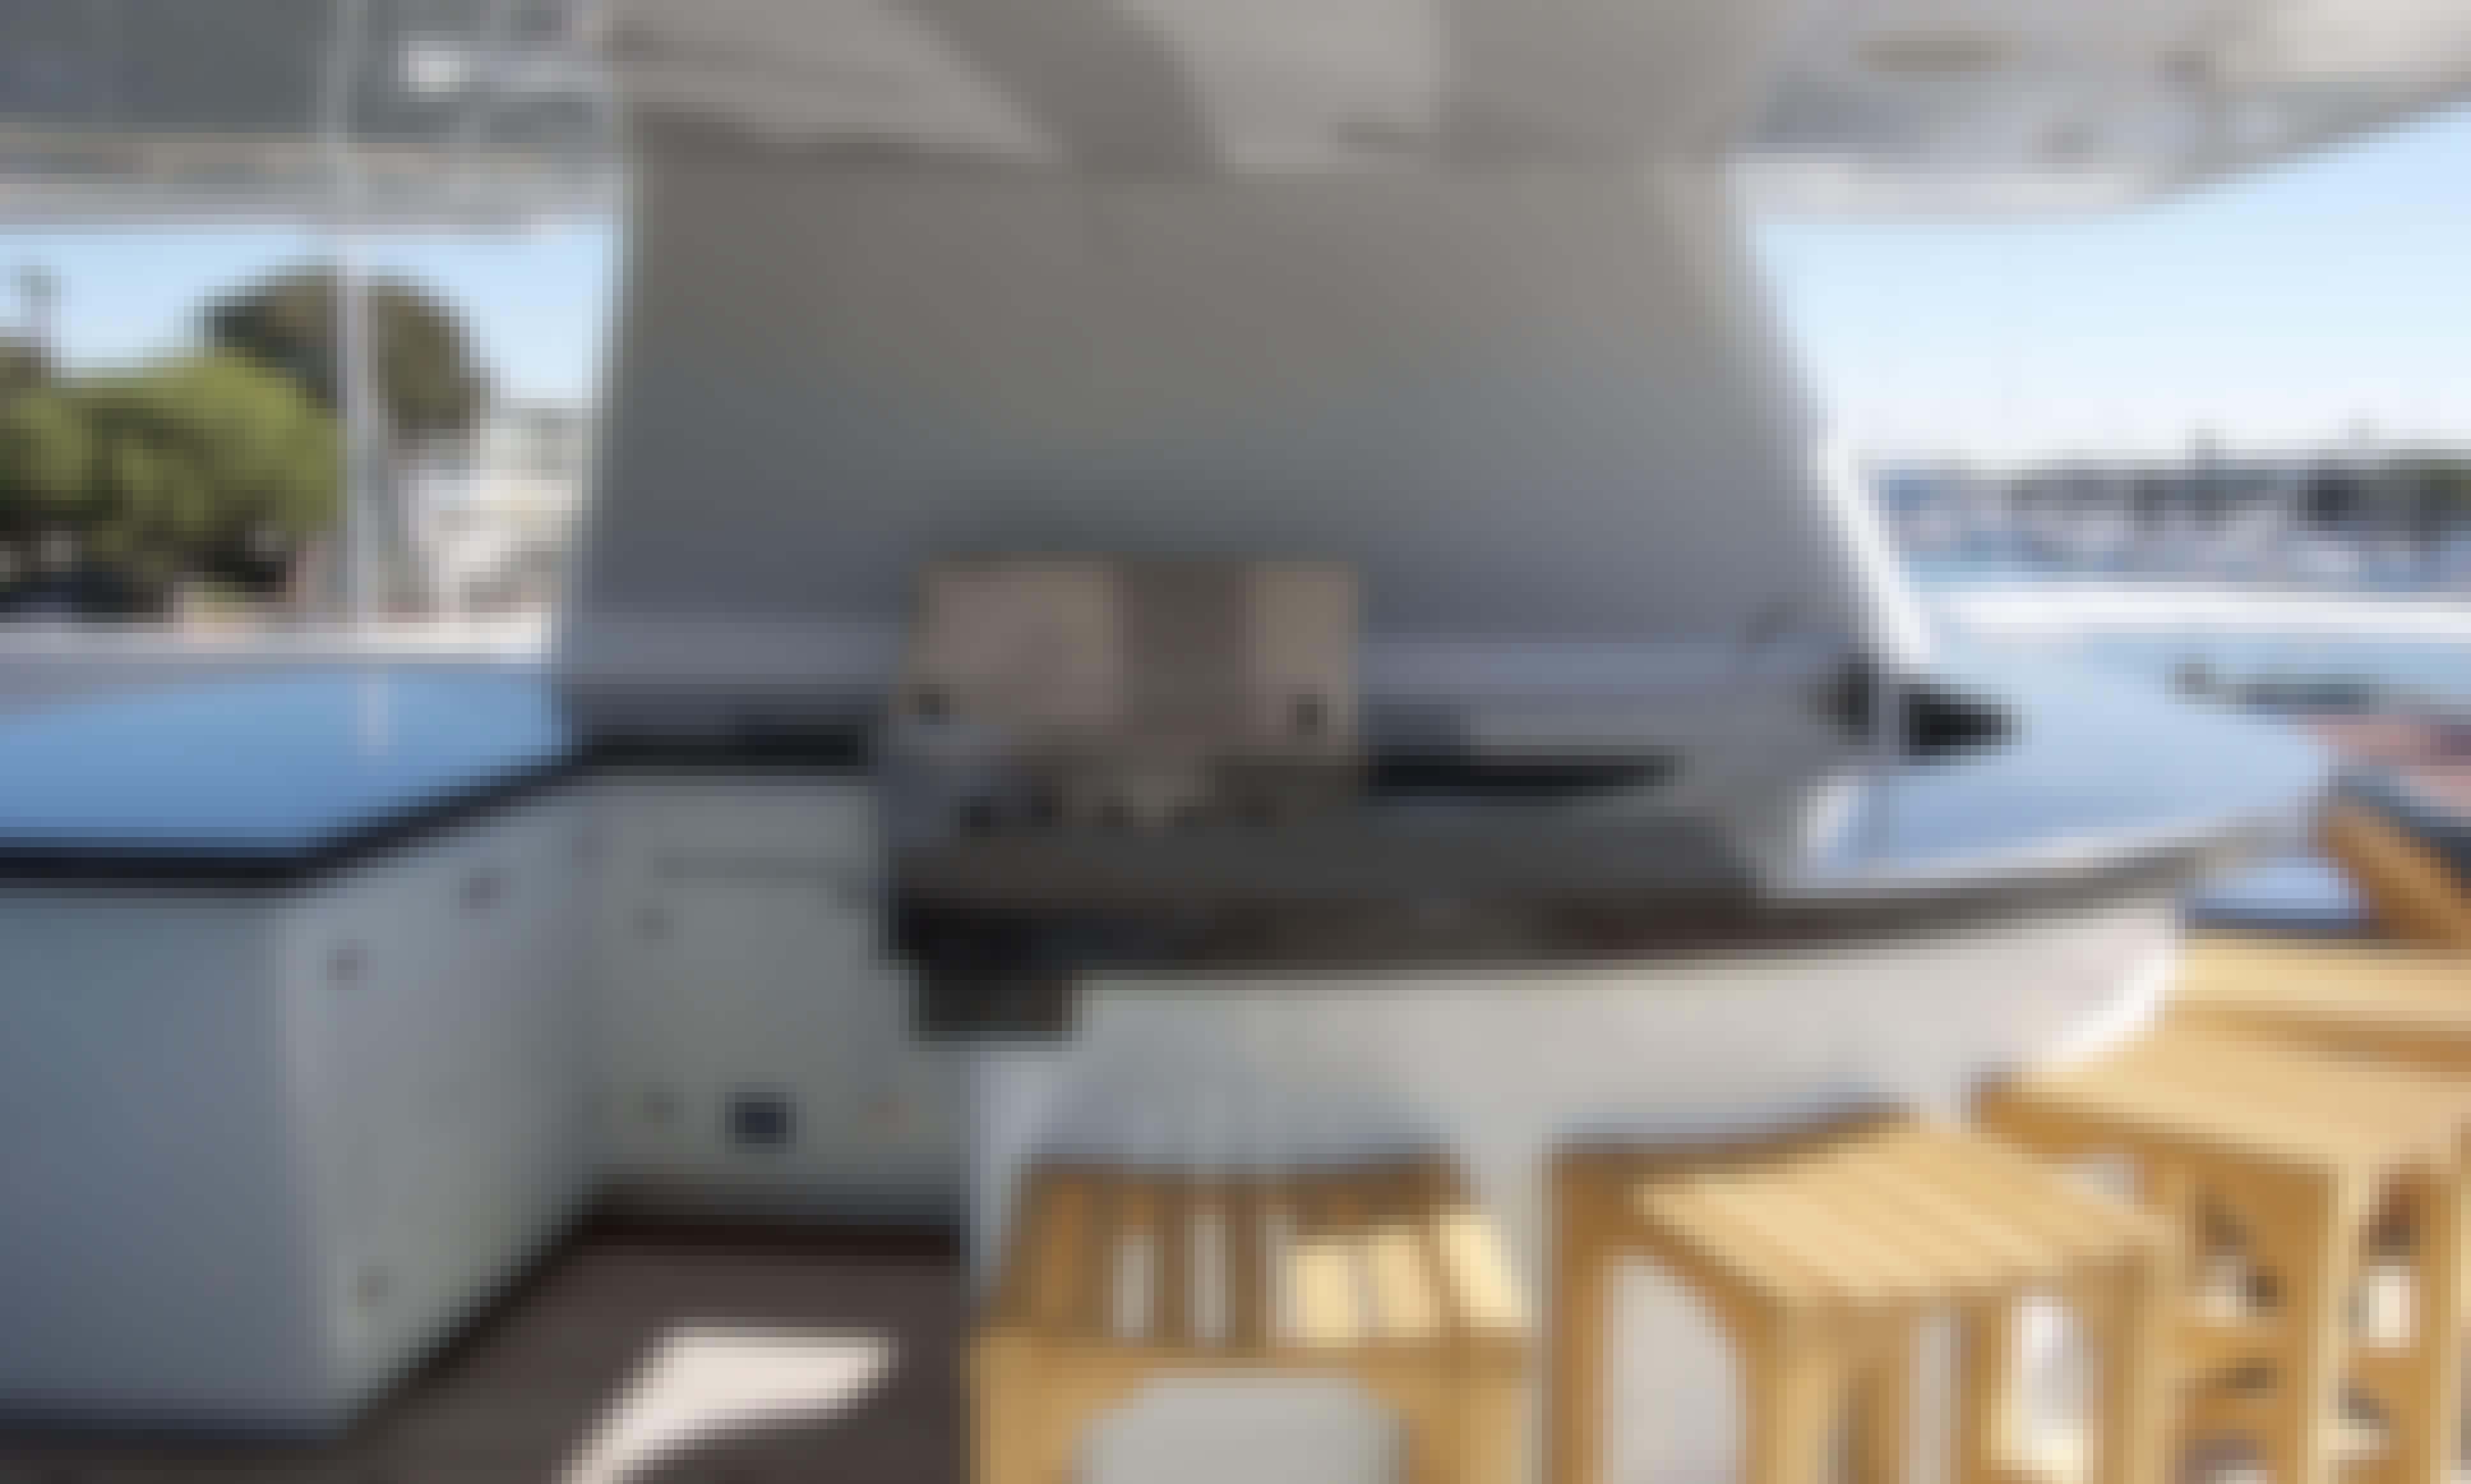 Charter the 143' Super Yacht in Newport Beach, California